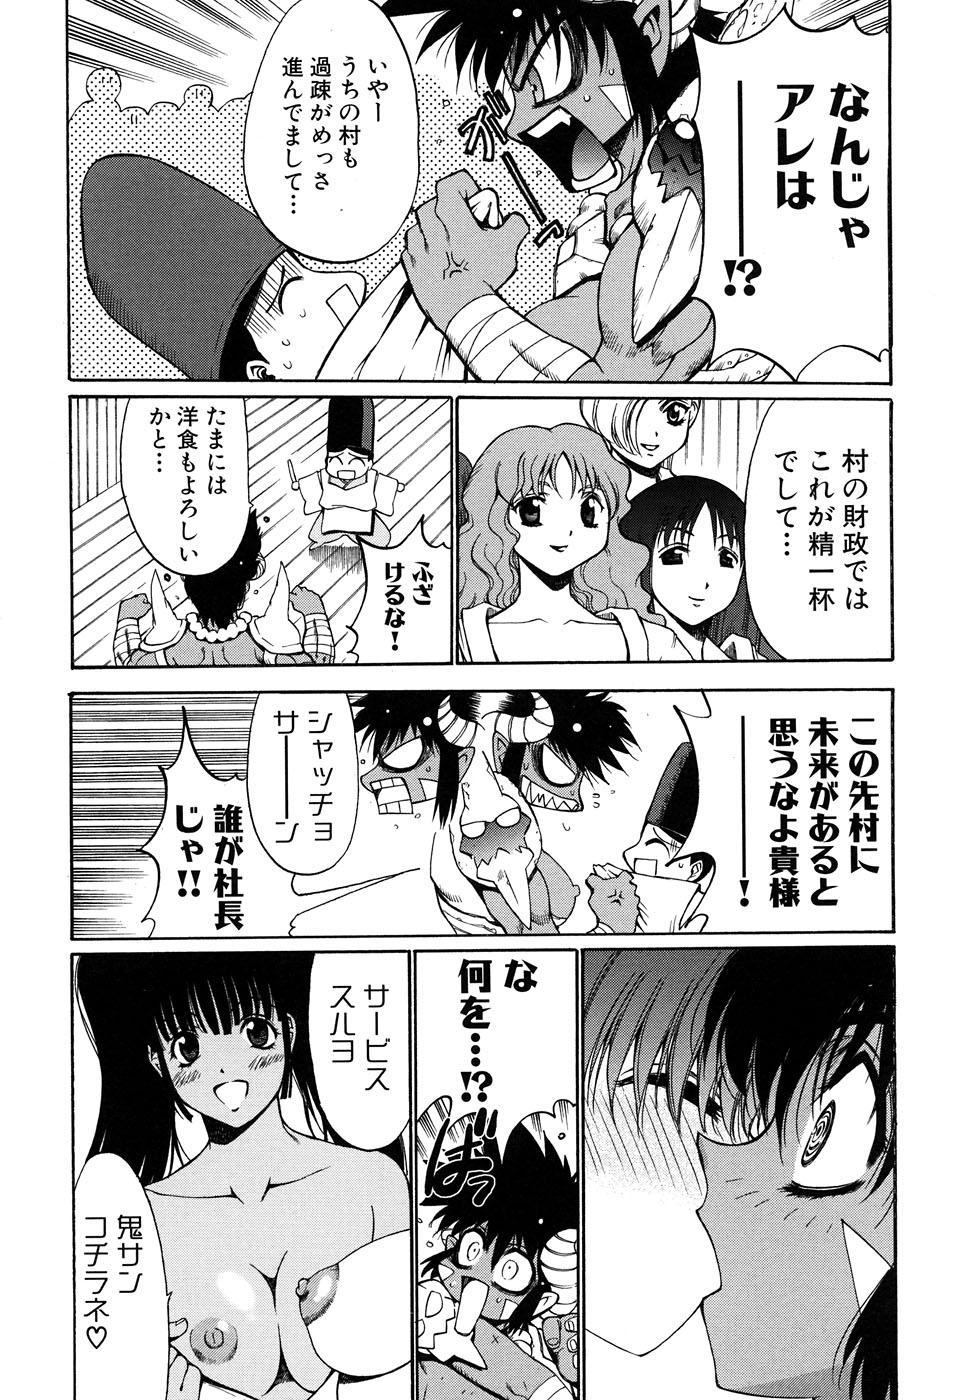 Fechikko VS Series ROUND.2 Miko San VS Maid San 56